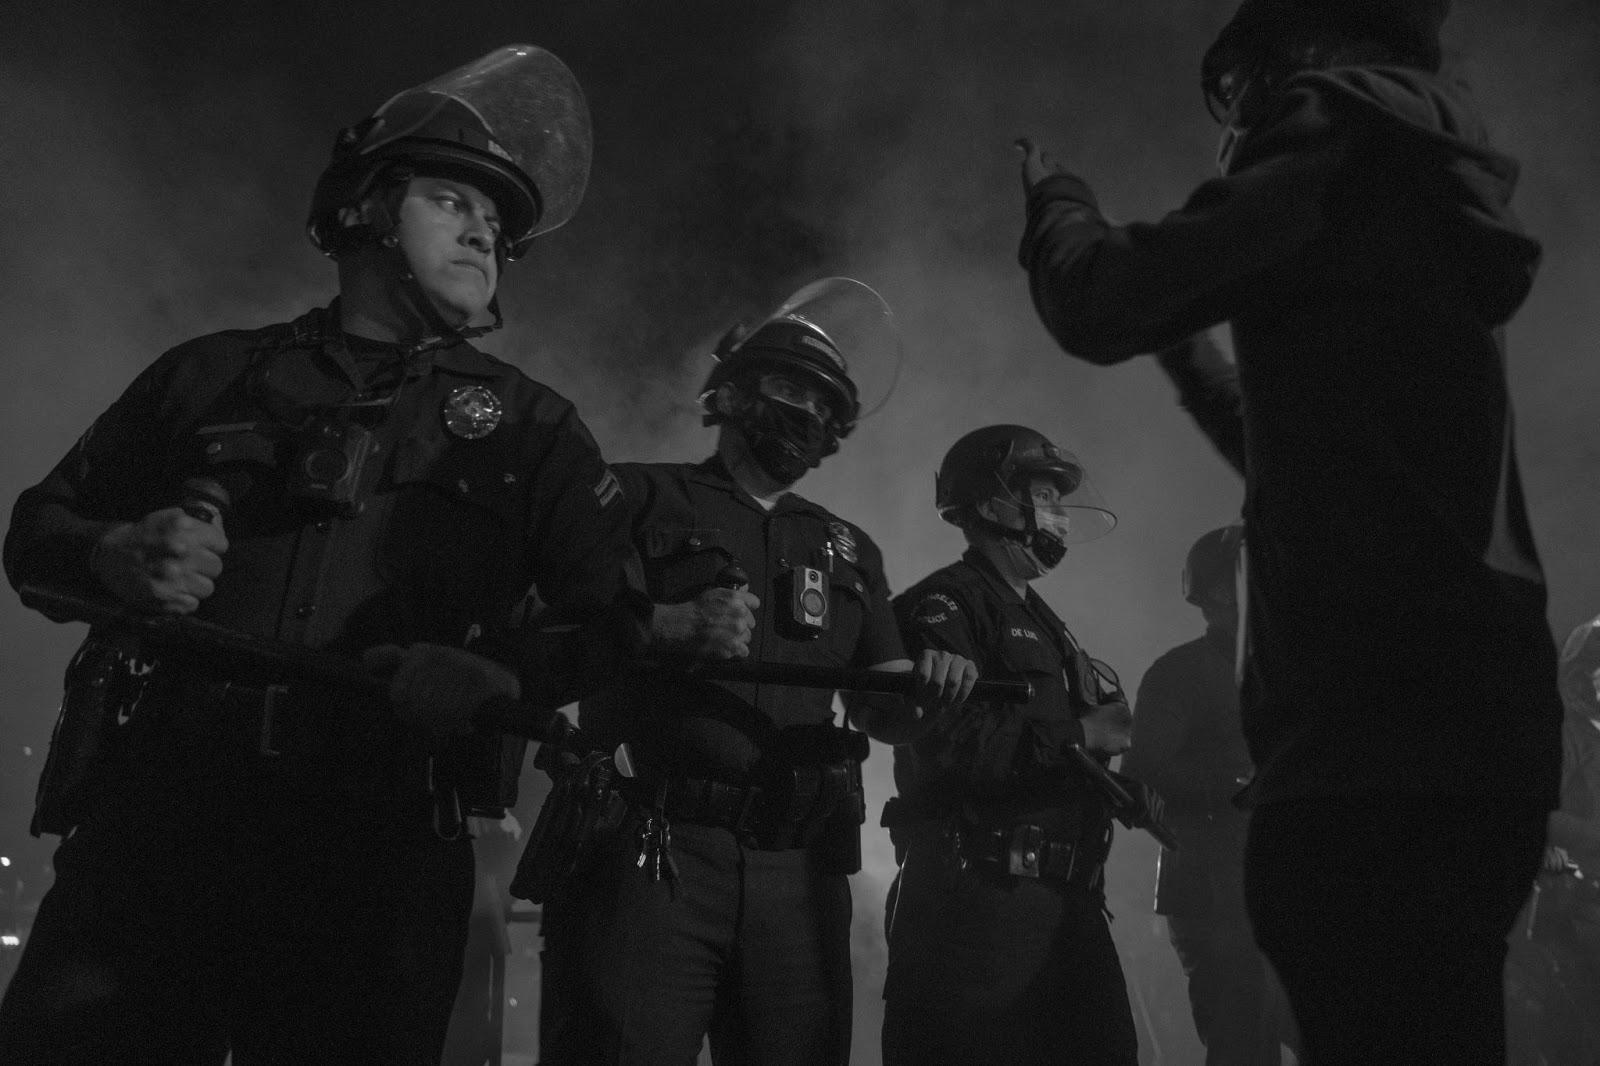 Police ready batons